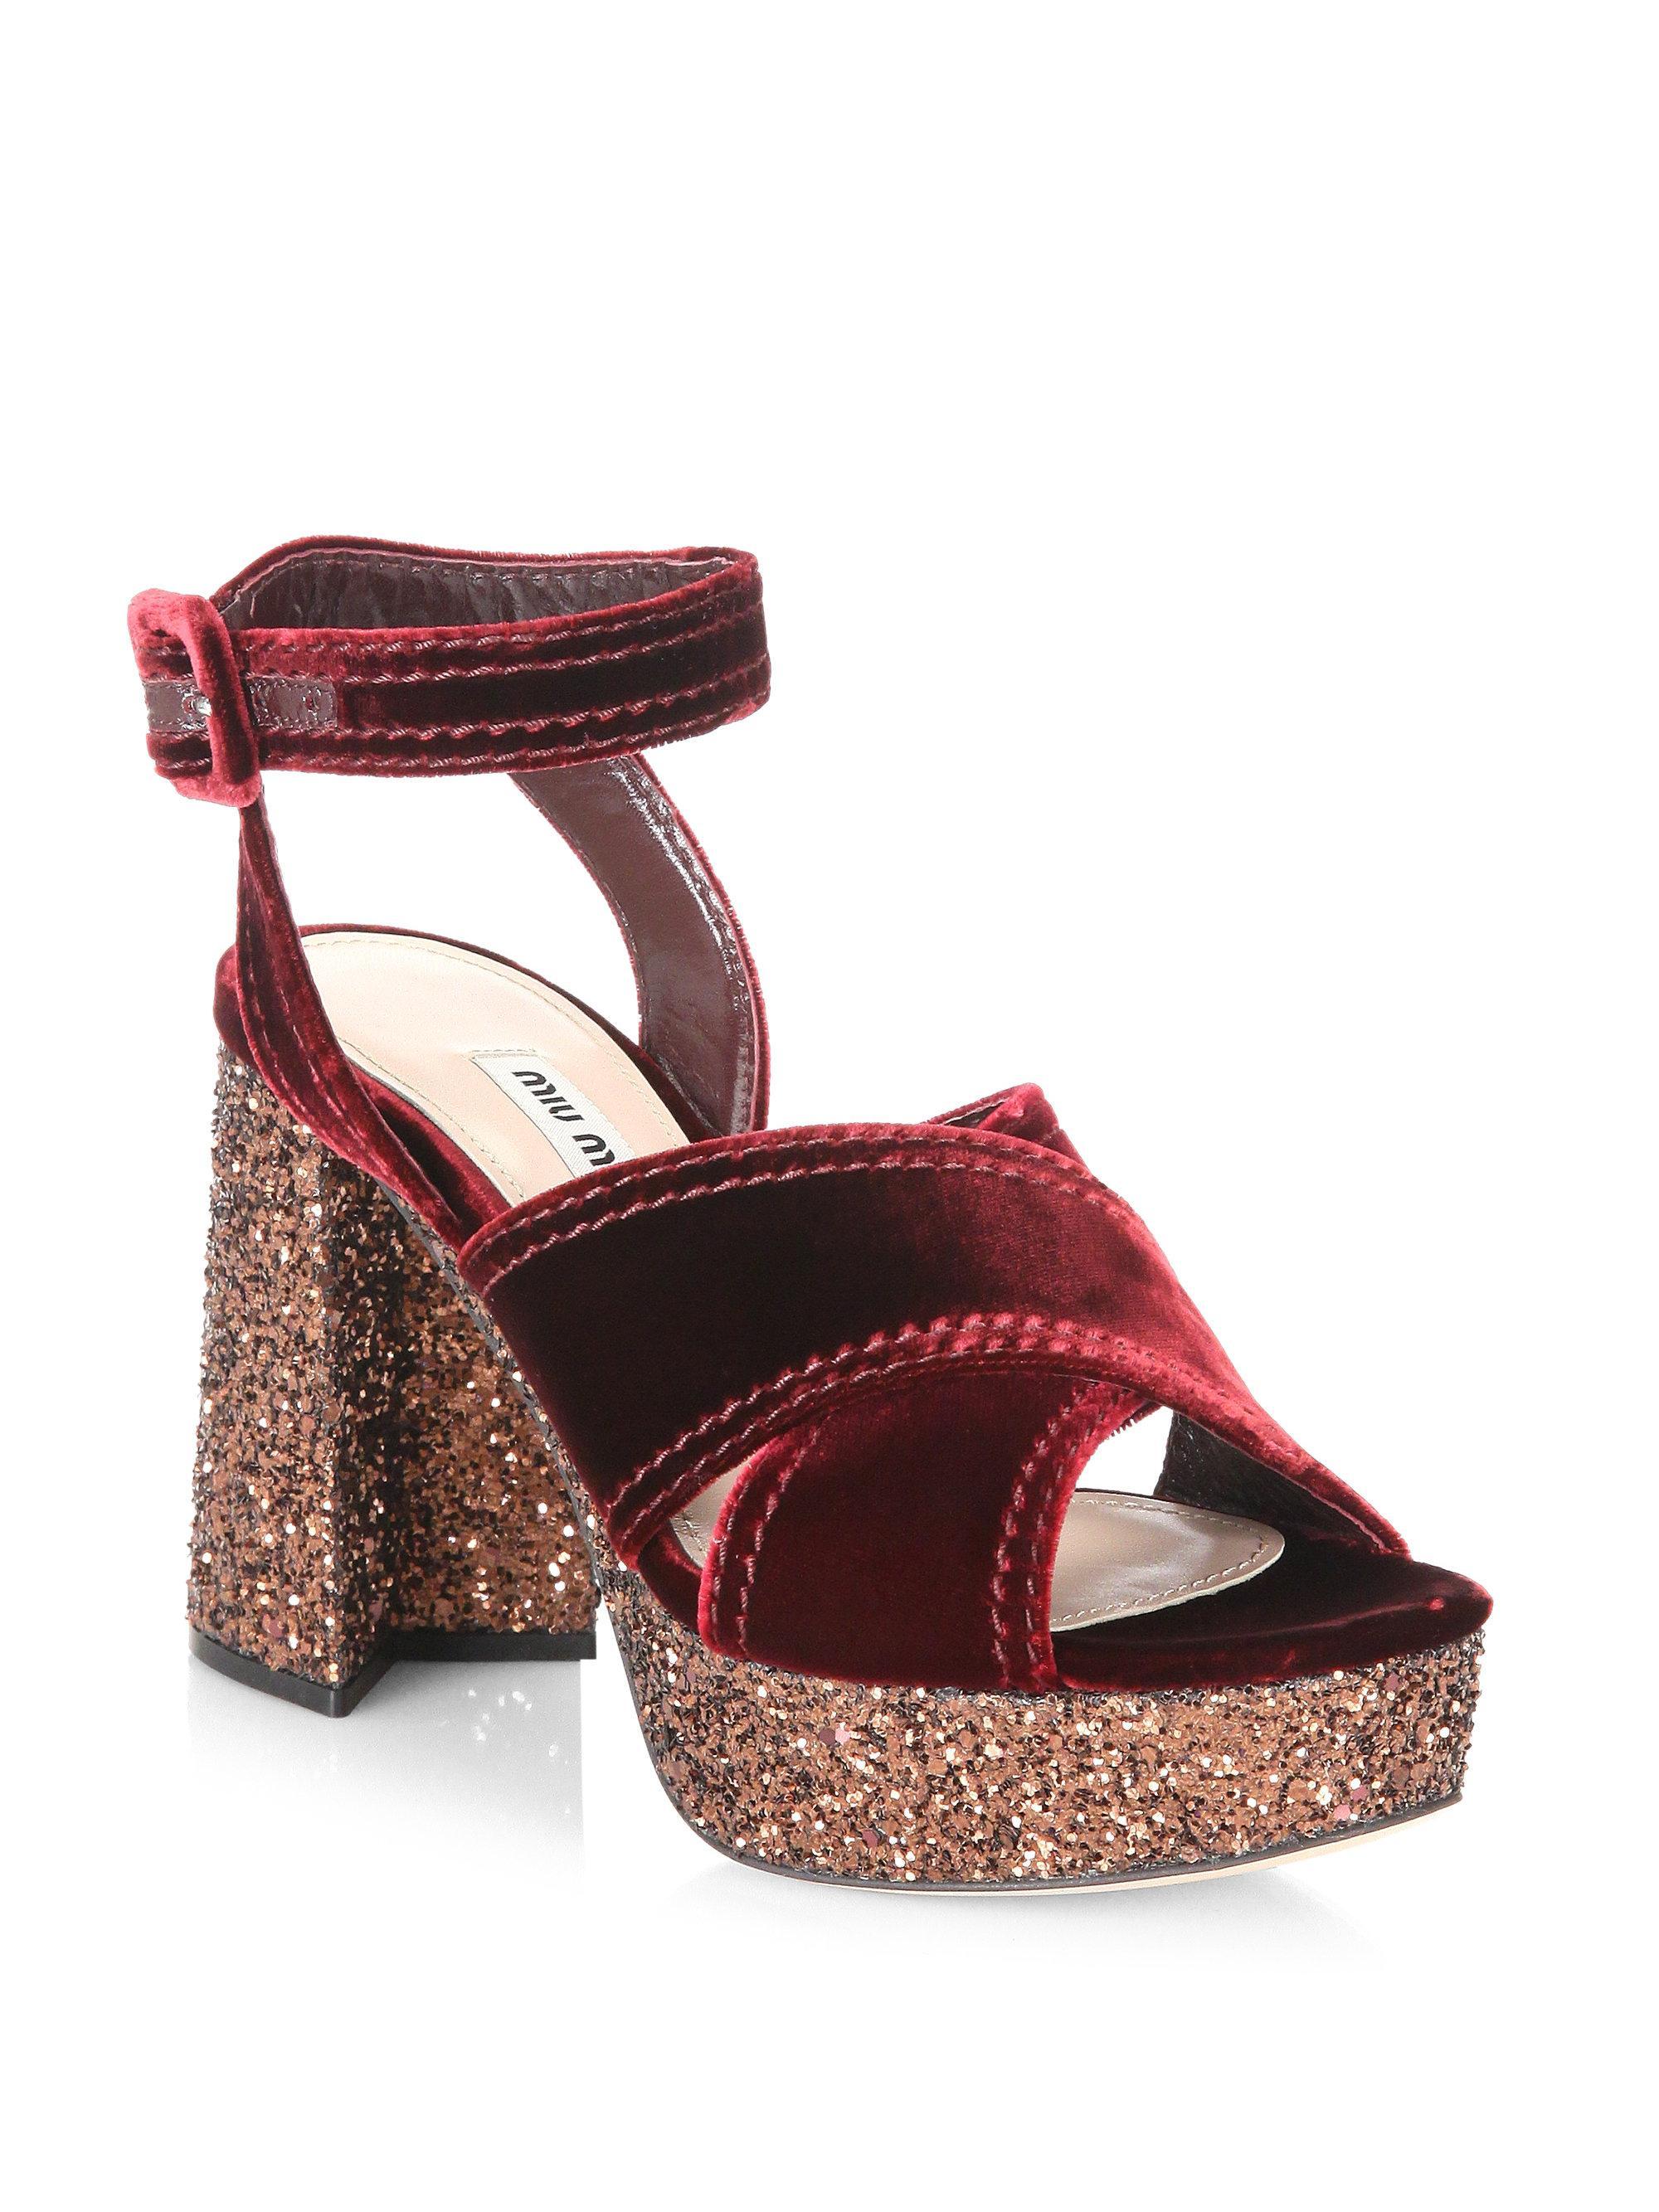 Miu Miu Velvet and glitter plateau sandals TFvwvg4s